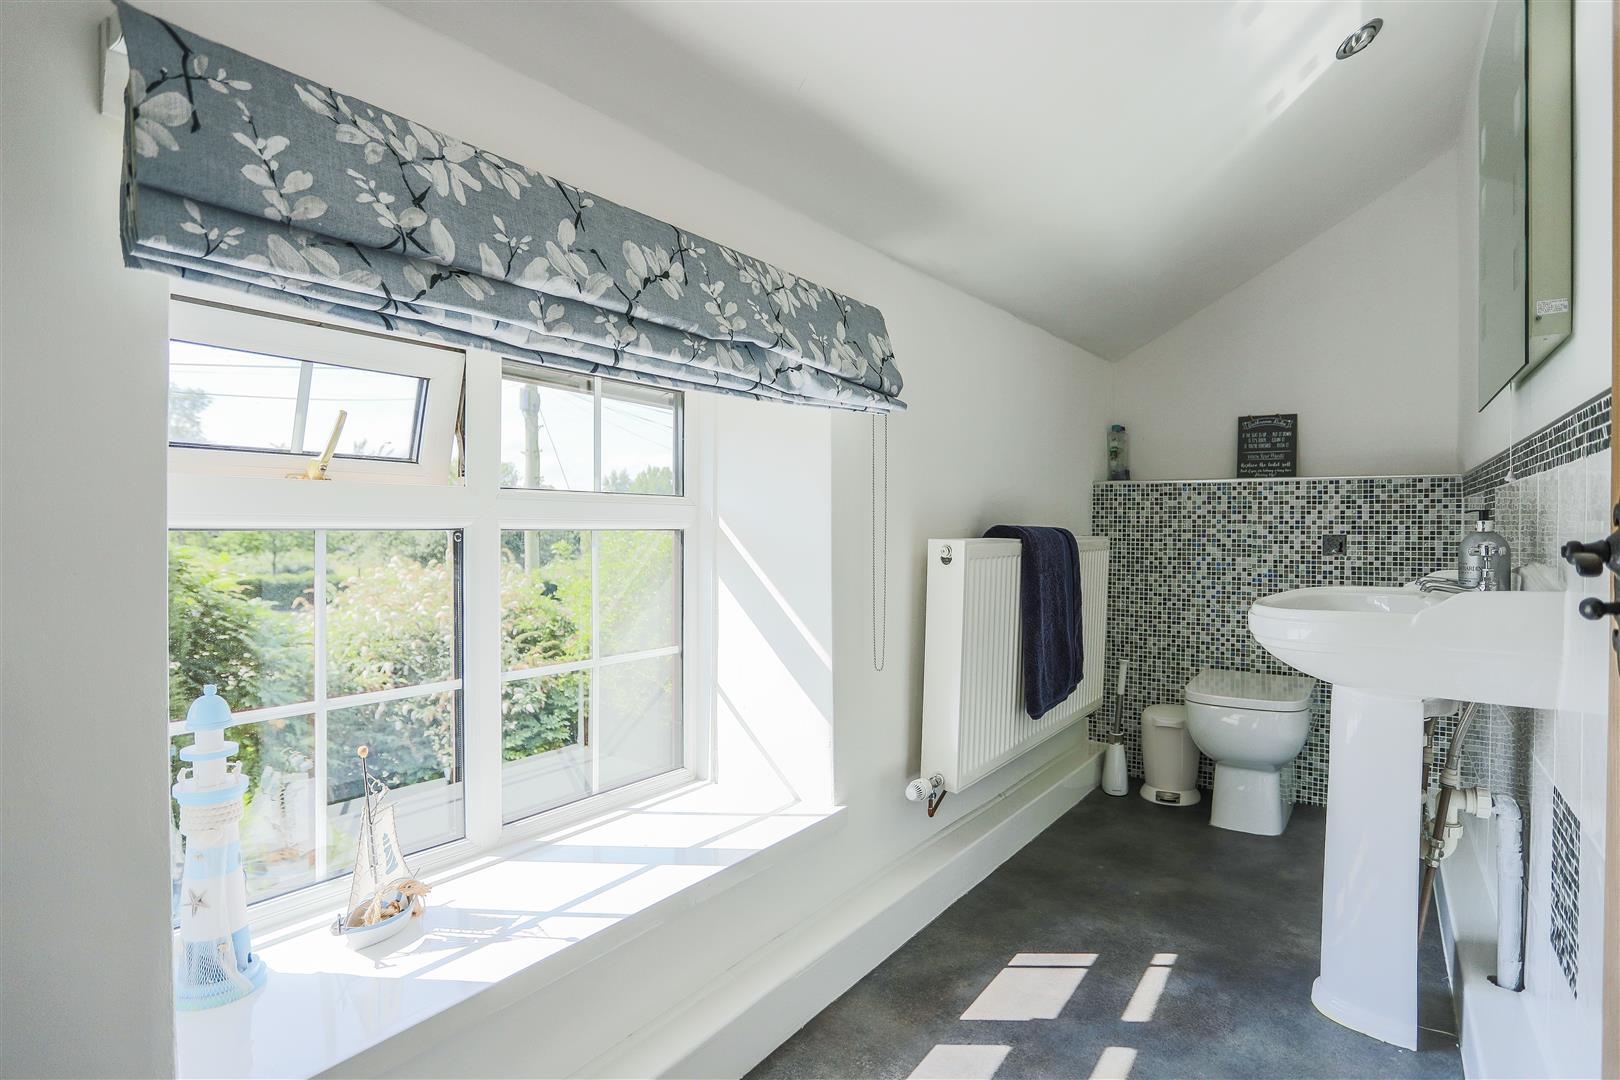 4 Bedroom Semi-detached House For Sale - 20.JPG